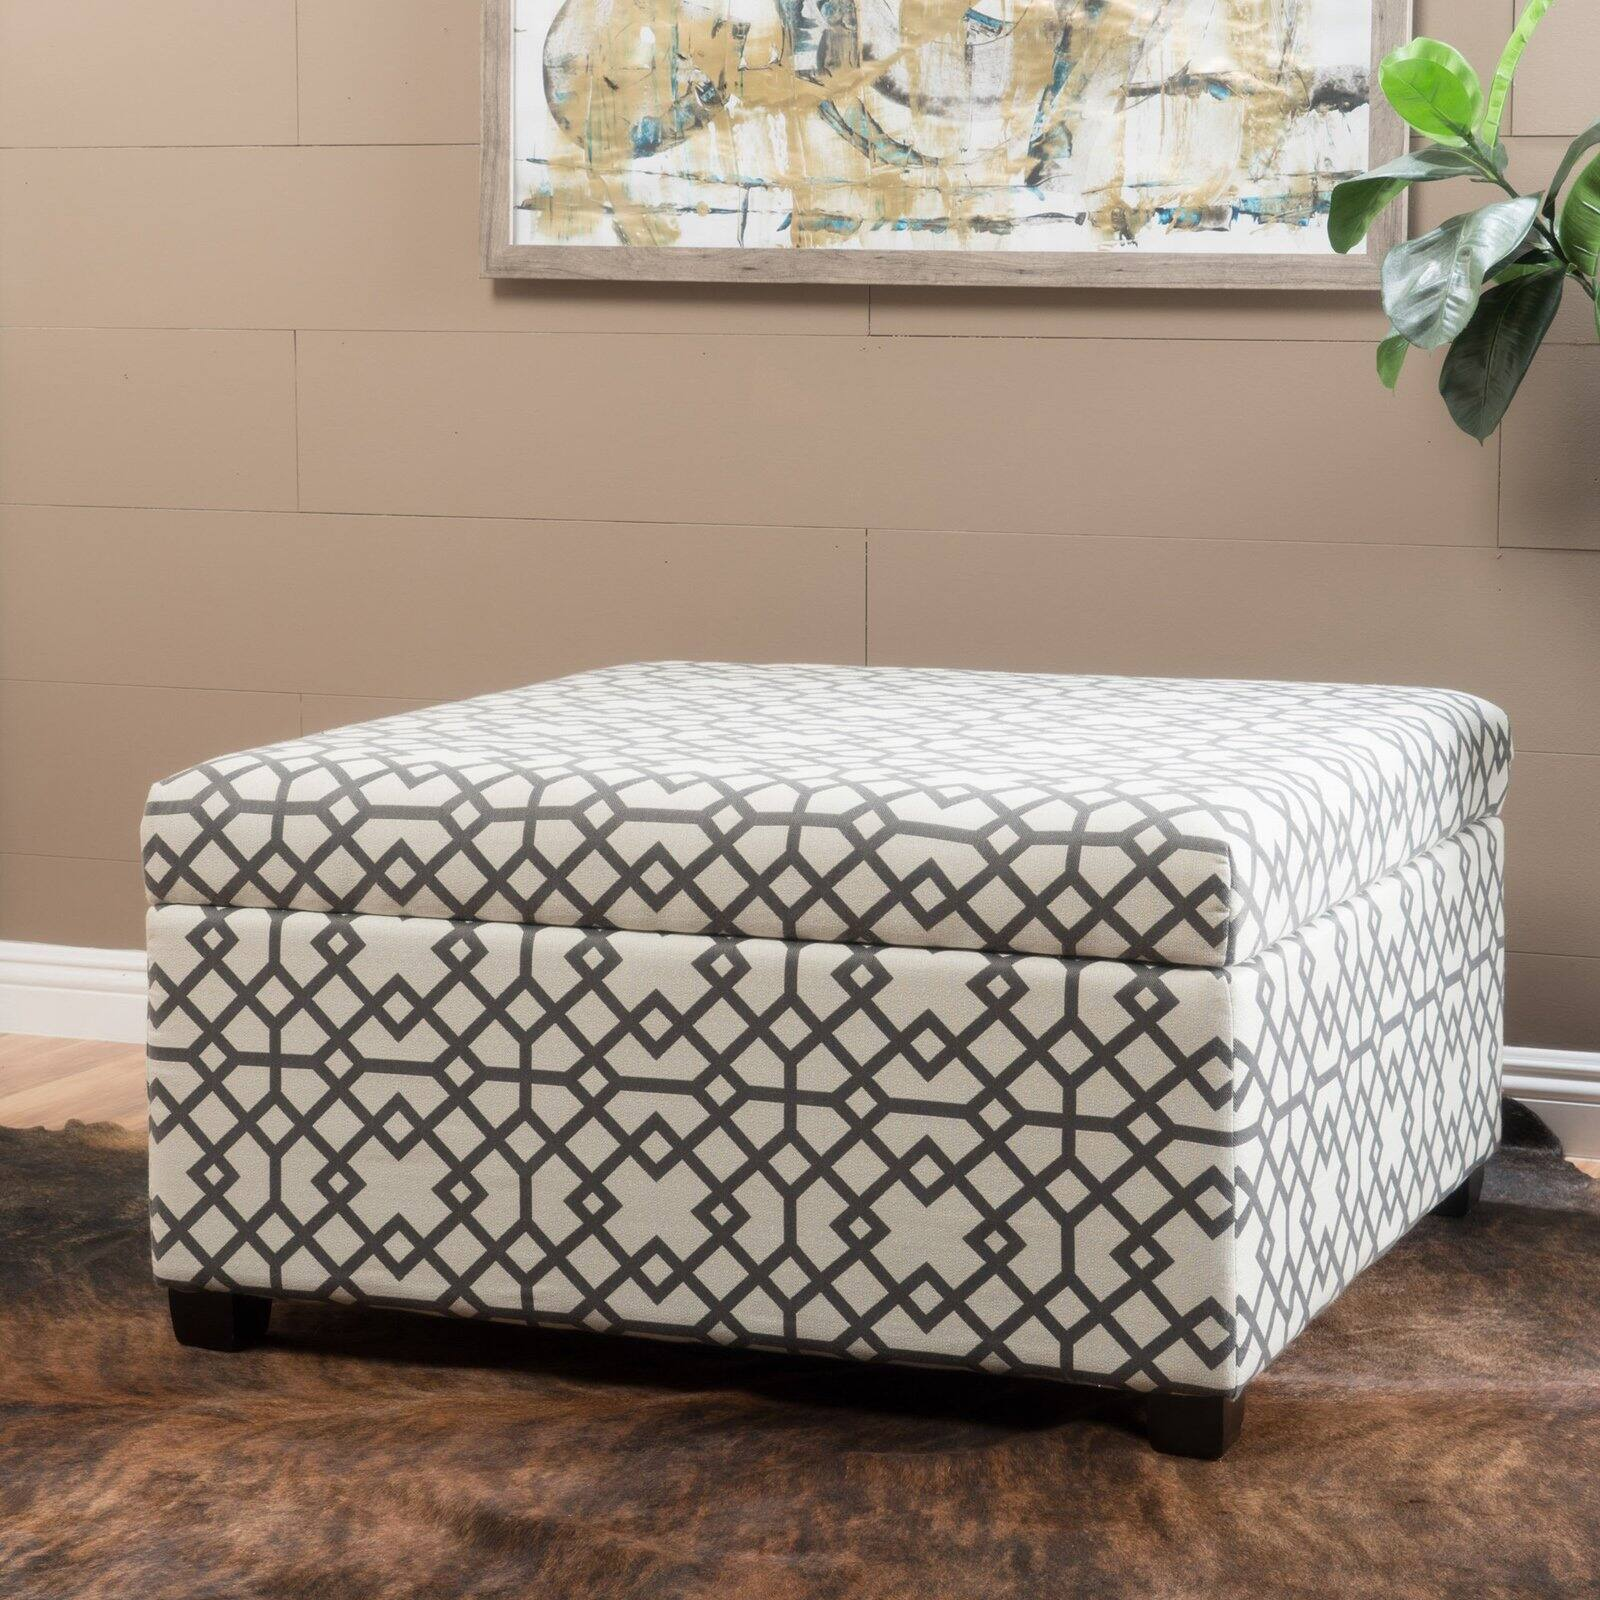 tempest geometric patterned fabric storage ottoman